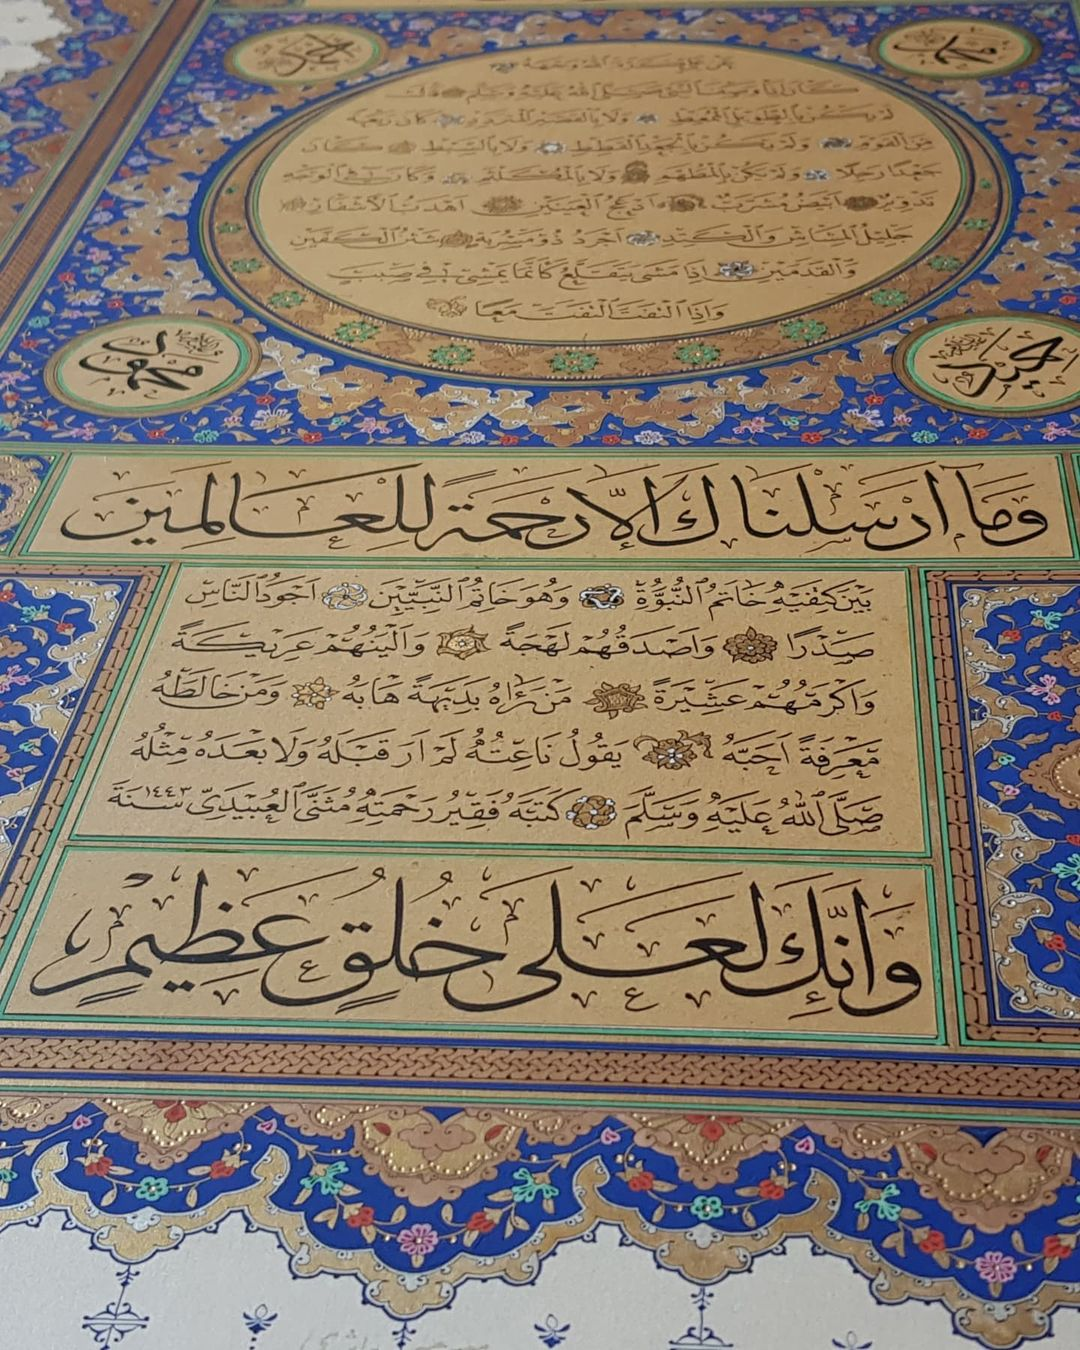 khat/hat/kat Tsulust/Thuluth Mothana Alobaydi حلية جديدة مذهبة design of zagrfa is for @sayin.ayse... 1131 4